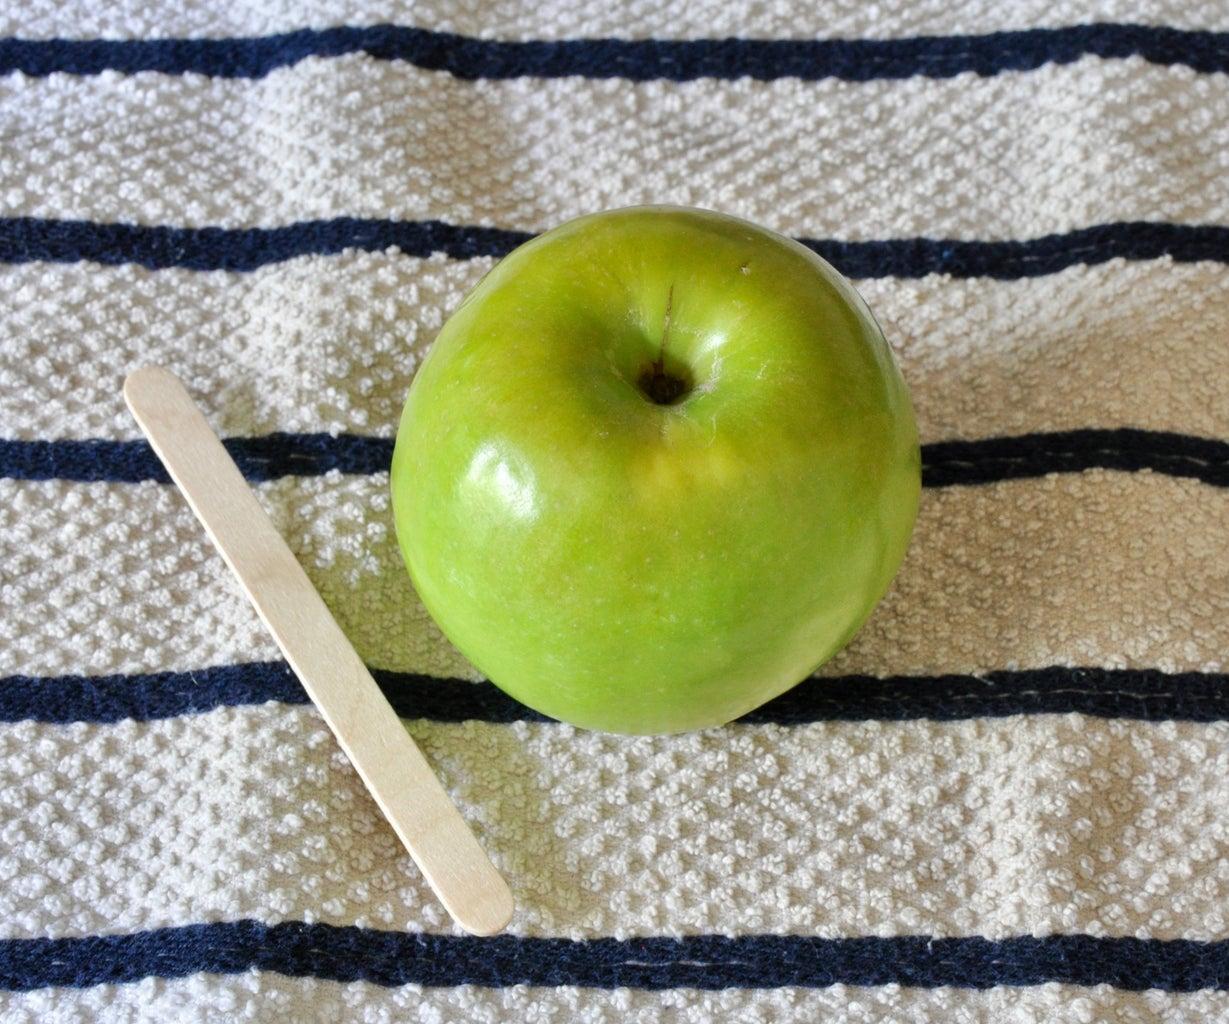 Prep Apples